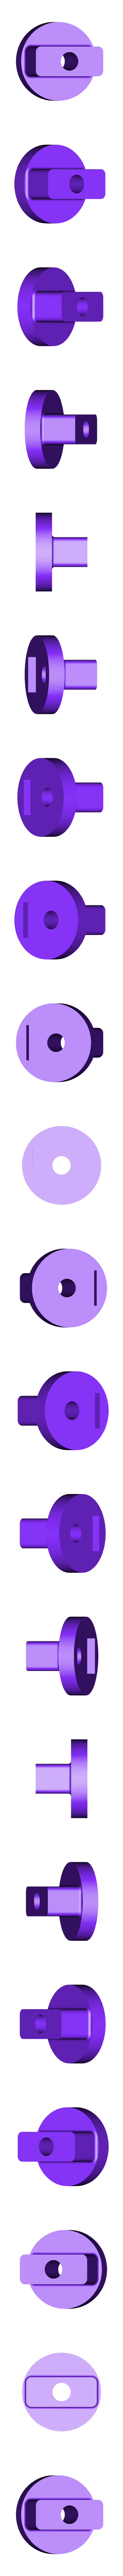 rondelle pointe.STL Download free STL file door security • 3D printer object, robroy